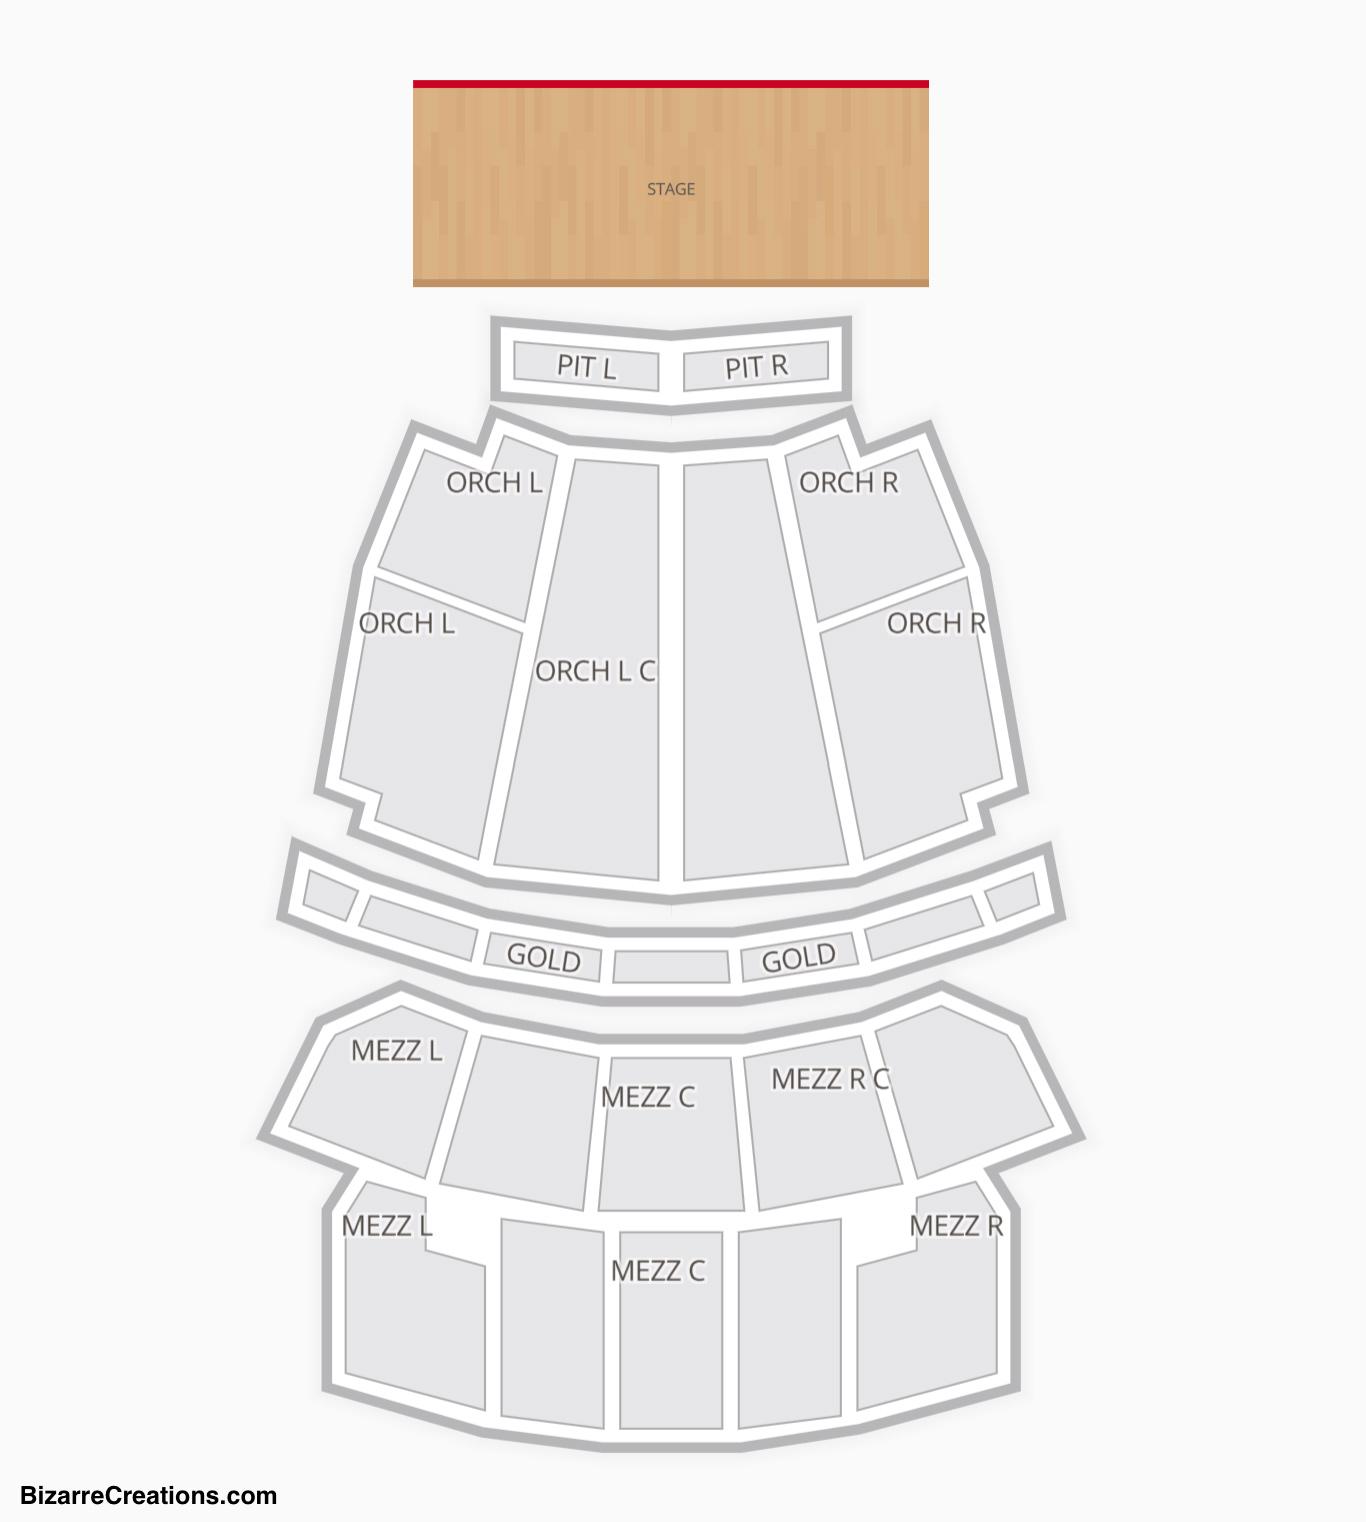 Stifel Theatre Seating Chart Salina St Louis